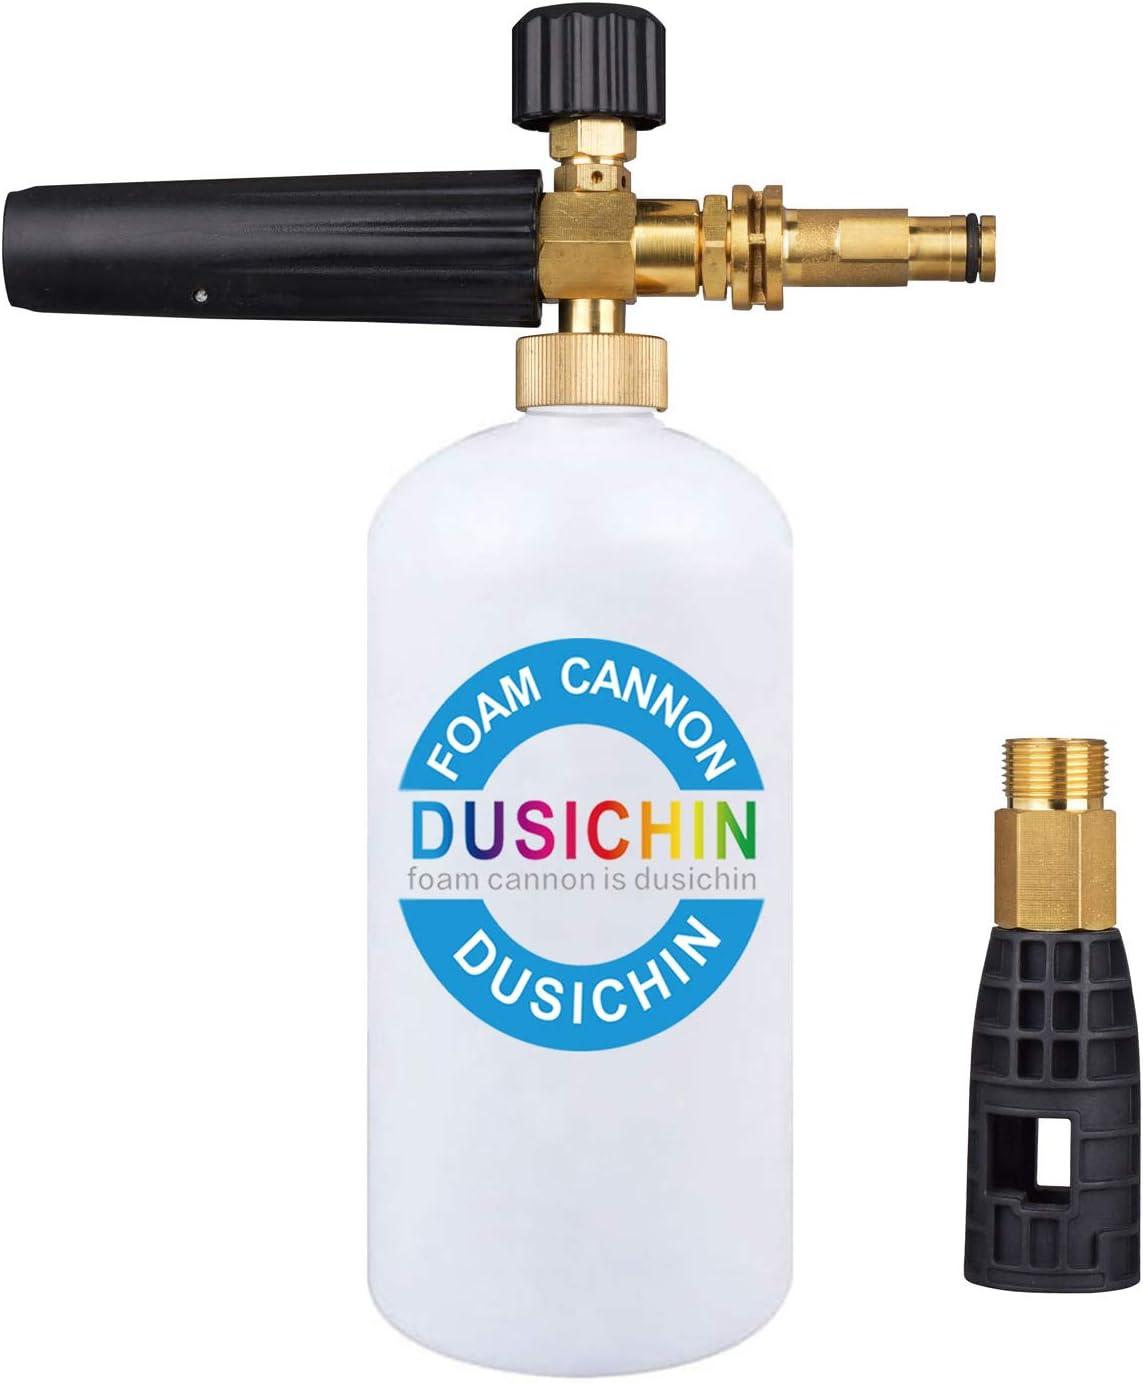 DUSICHIN DUS-115 Foam Cannon Lance for Sun Joe Adjustable Snow Soap Sprayer Sunjoe SPX Pressure Washer Gun Jet Wash Brass Quick Connector 33Oz Container